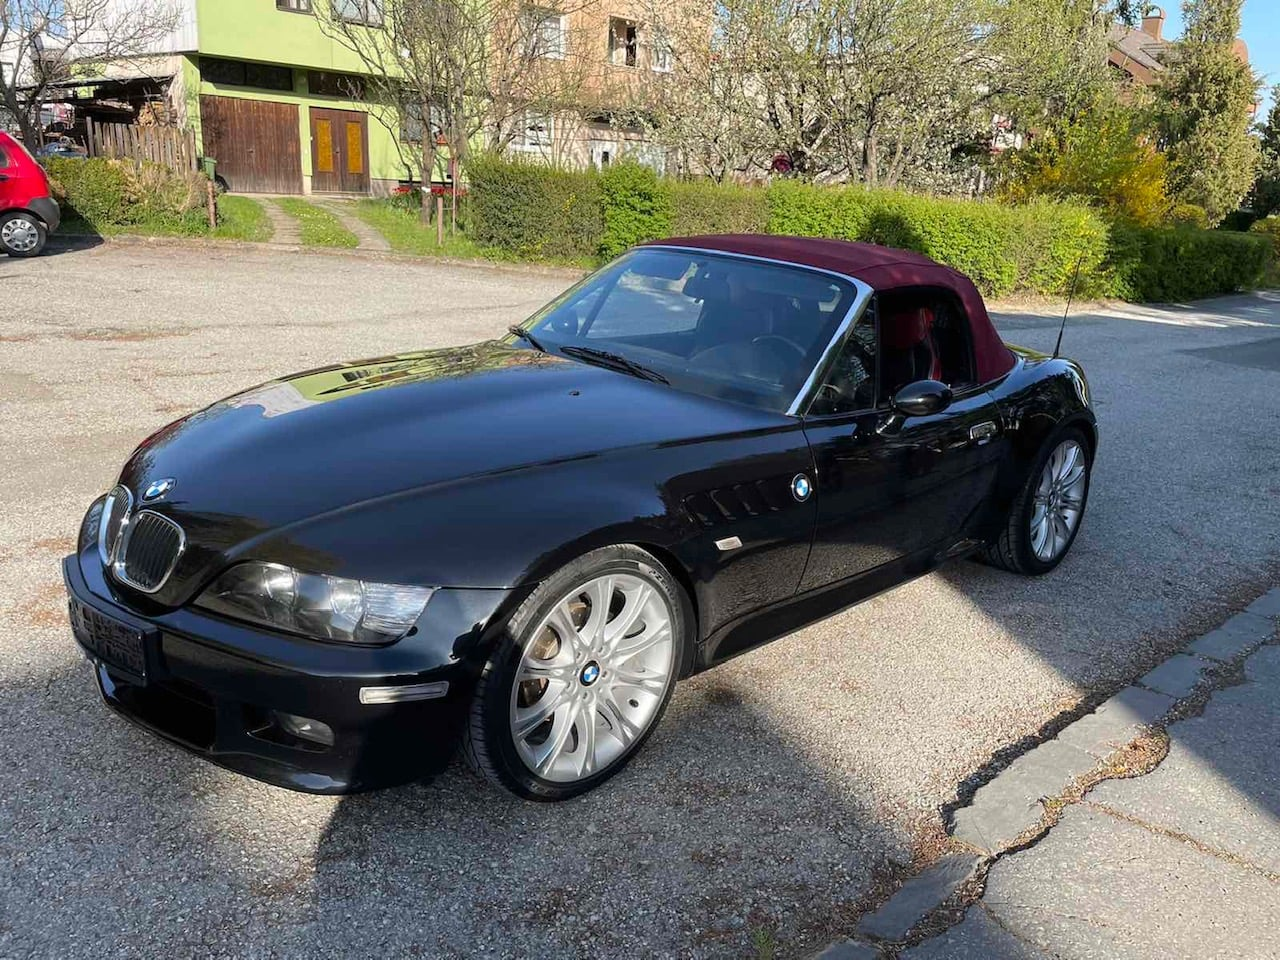 BMW_Z3_Roadster_Imola